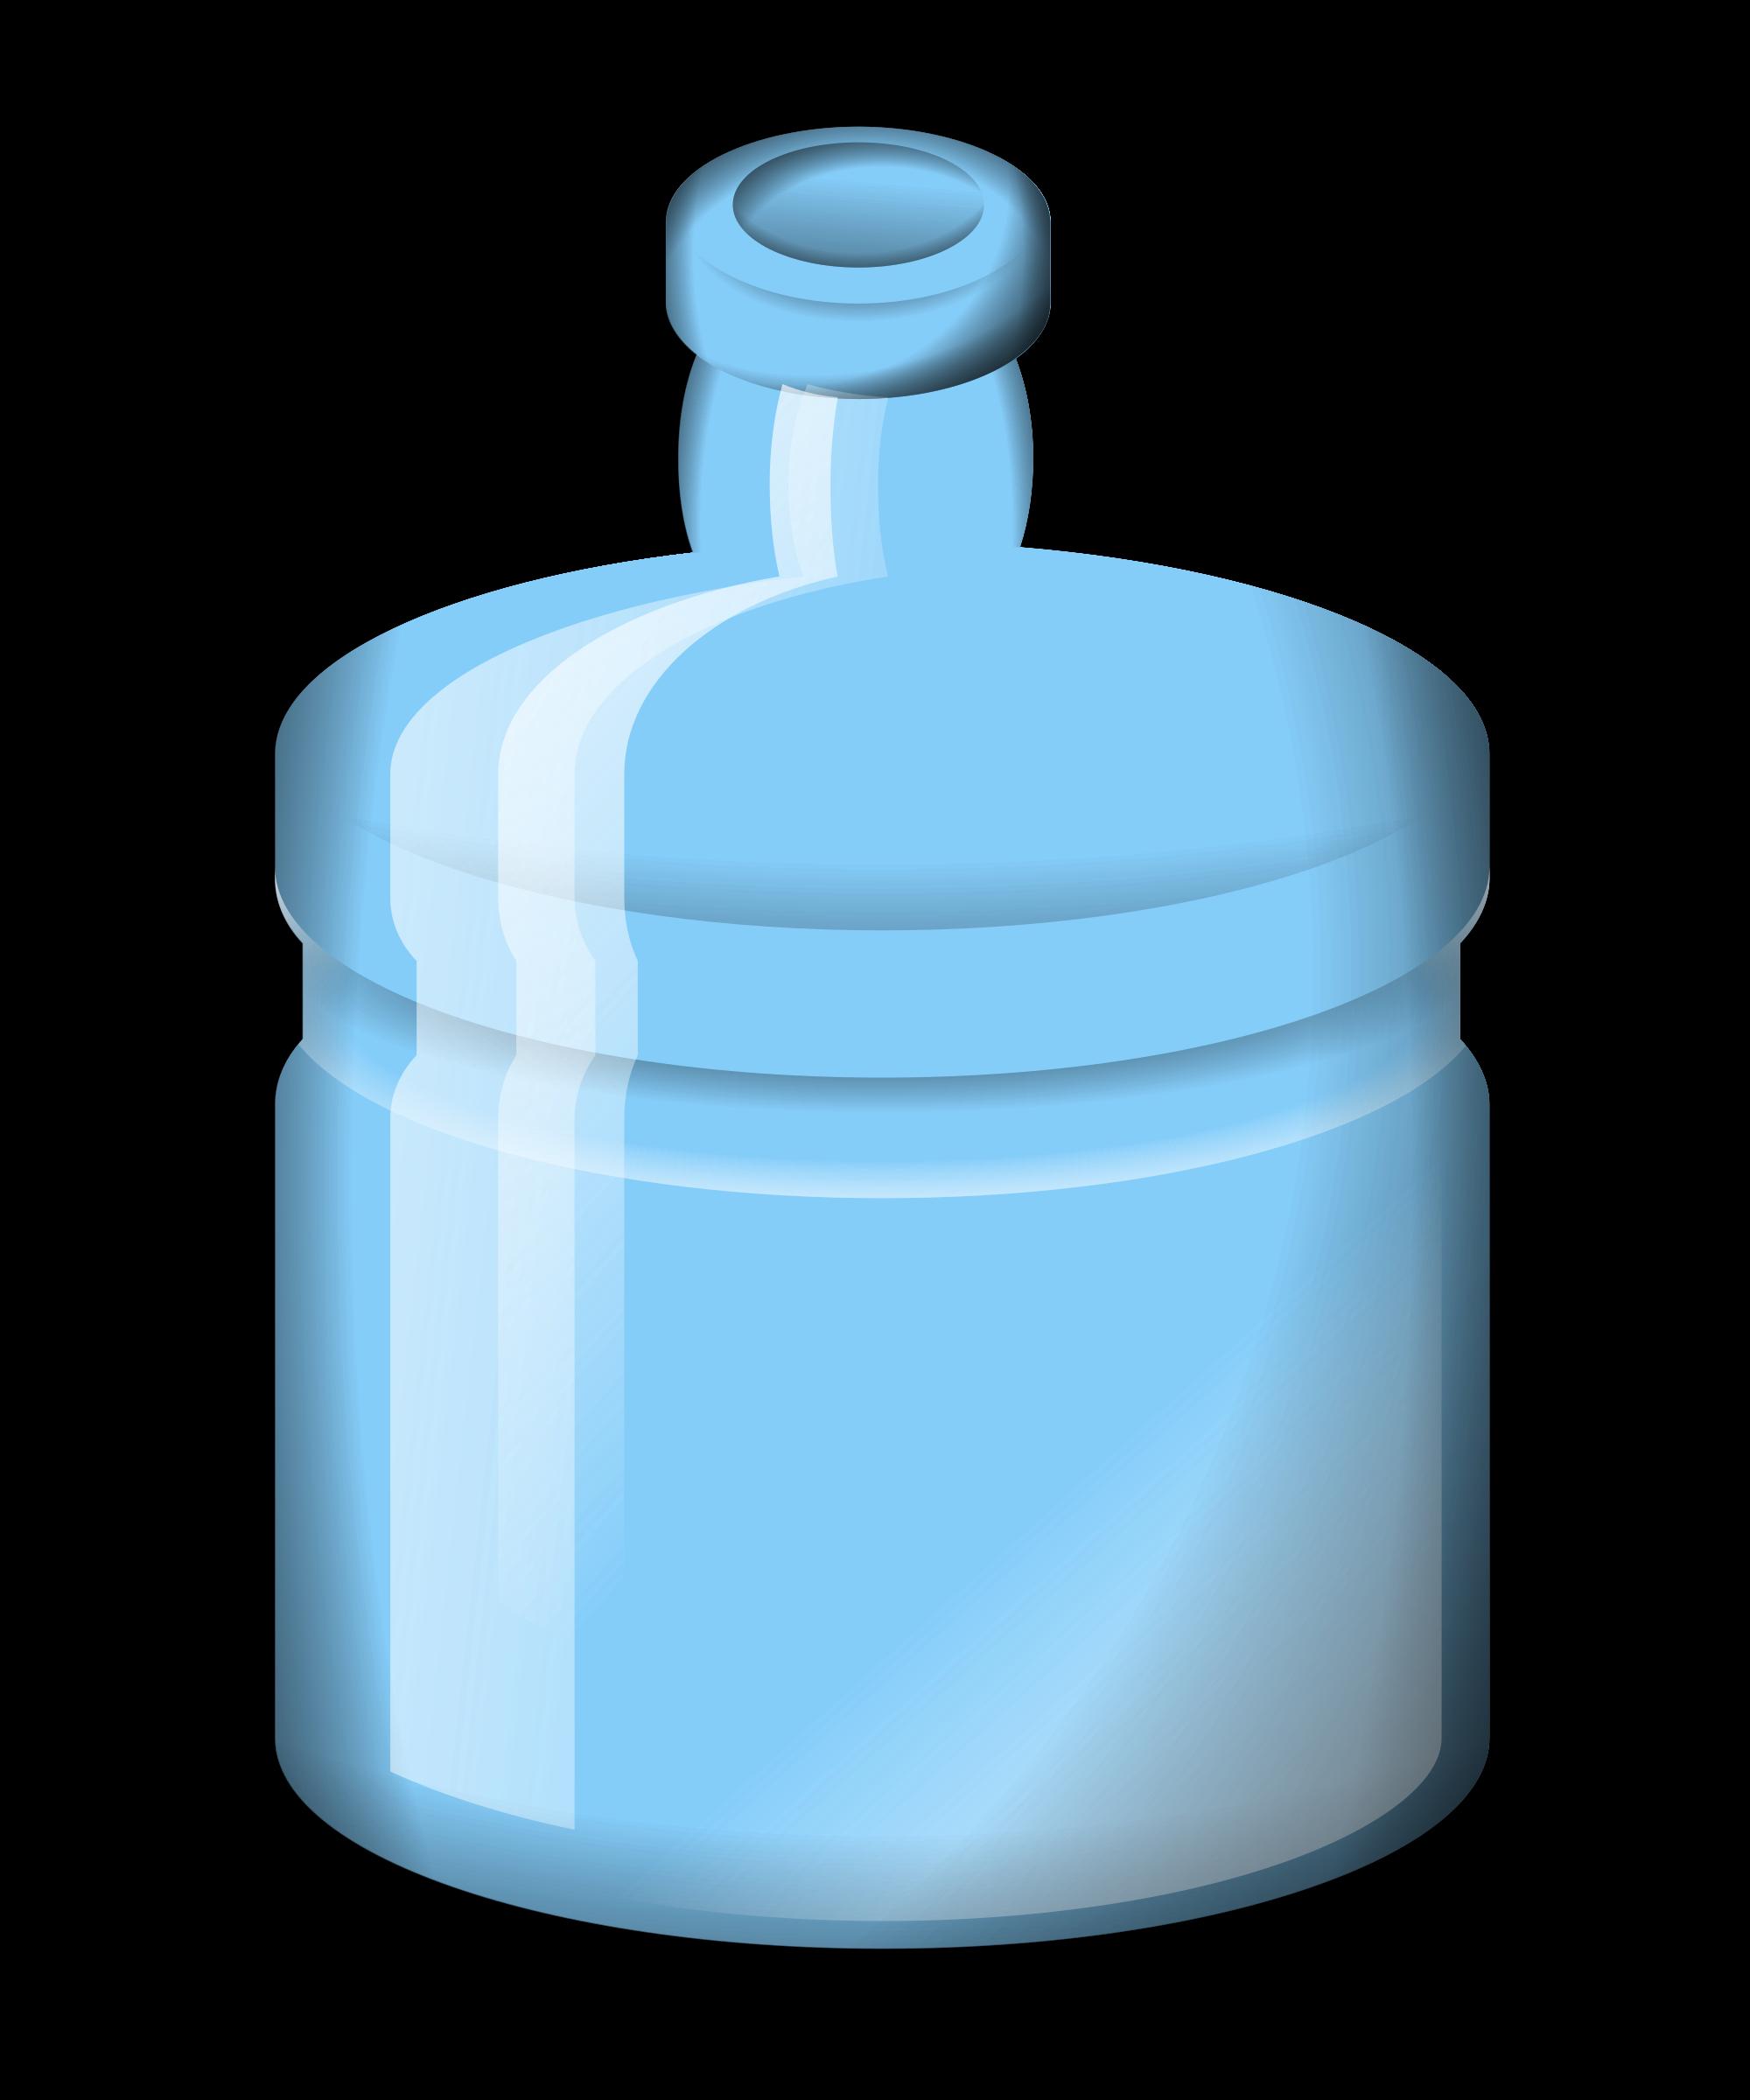 Jokingart com. Clipart backpack water bottle